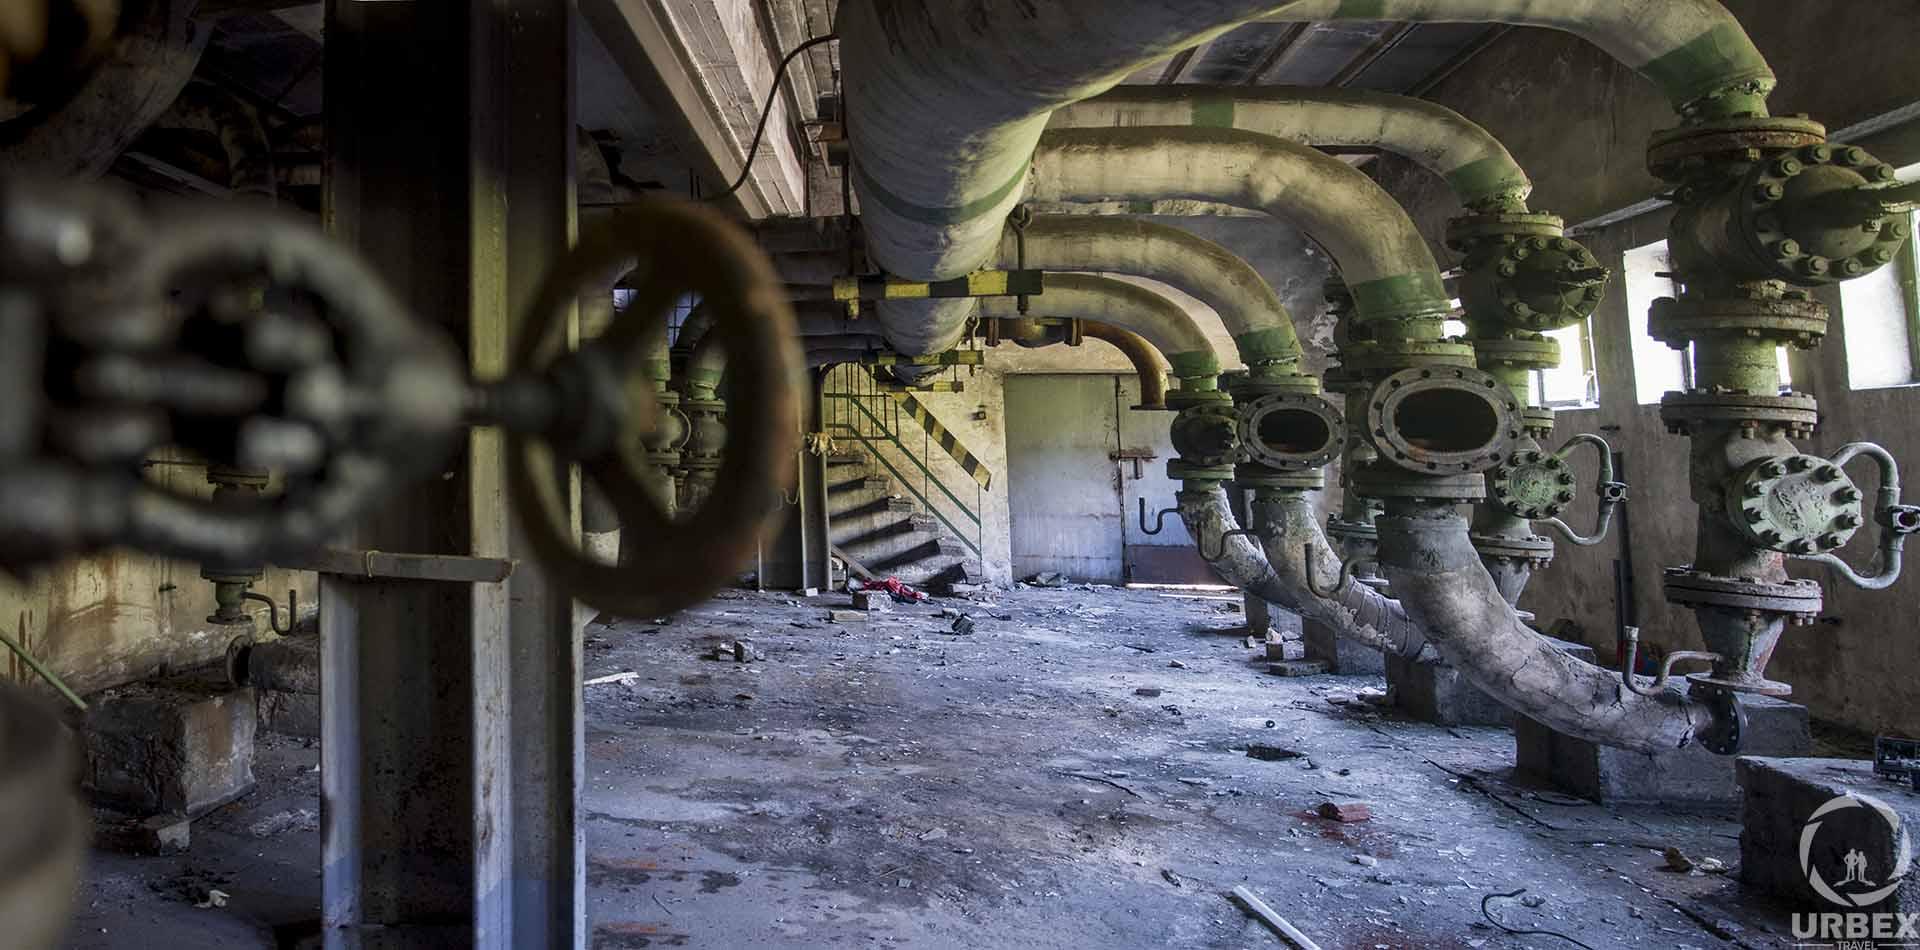 Pipes in Abandoned Boiler Room in Zielonka